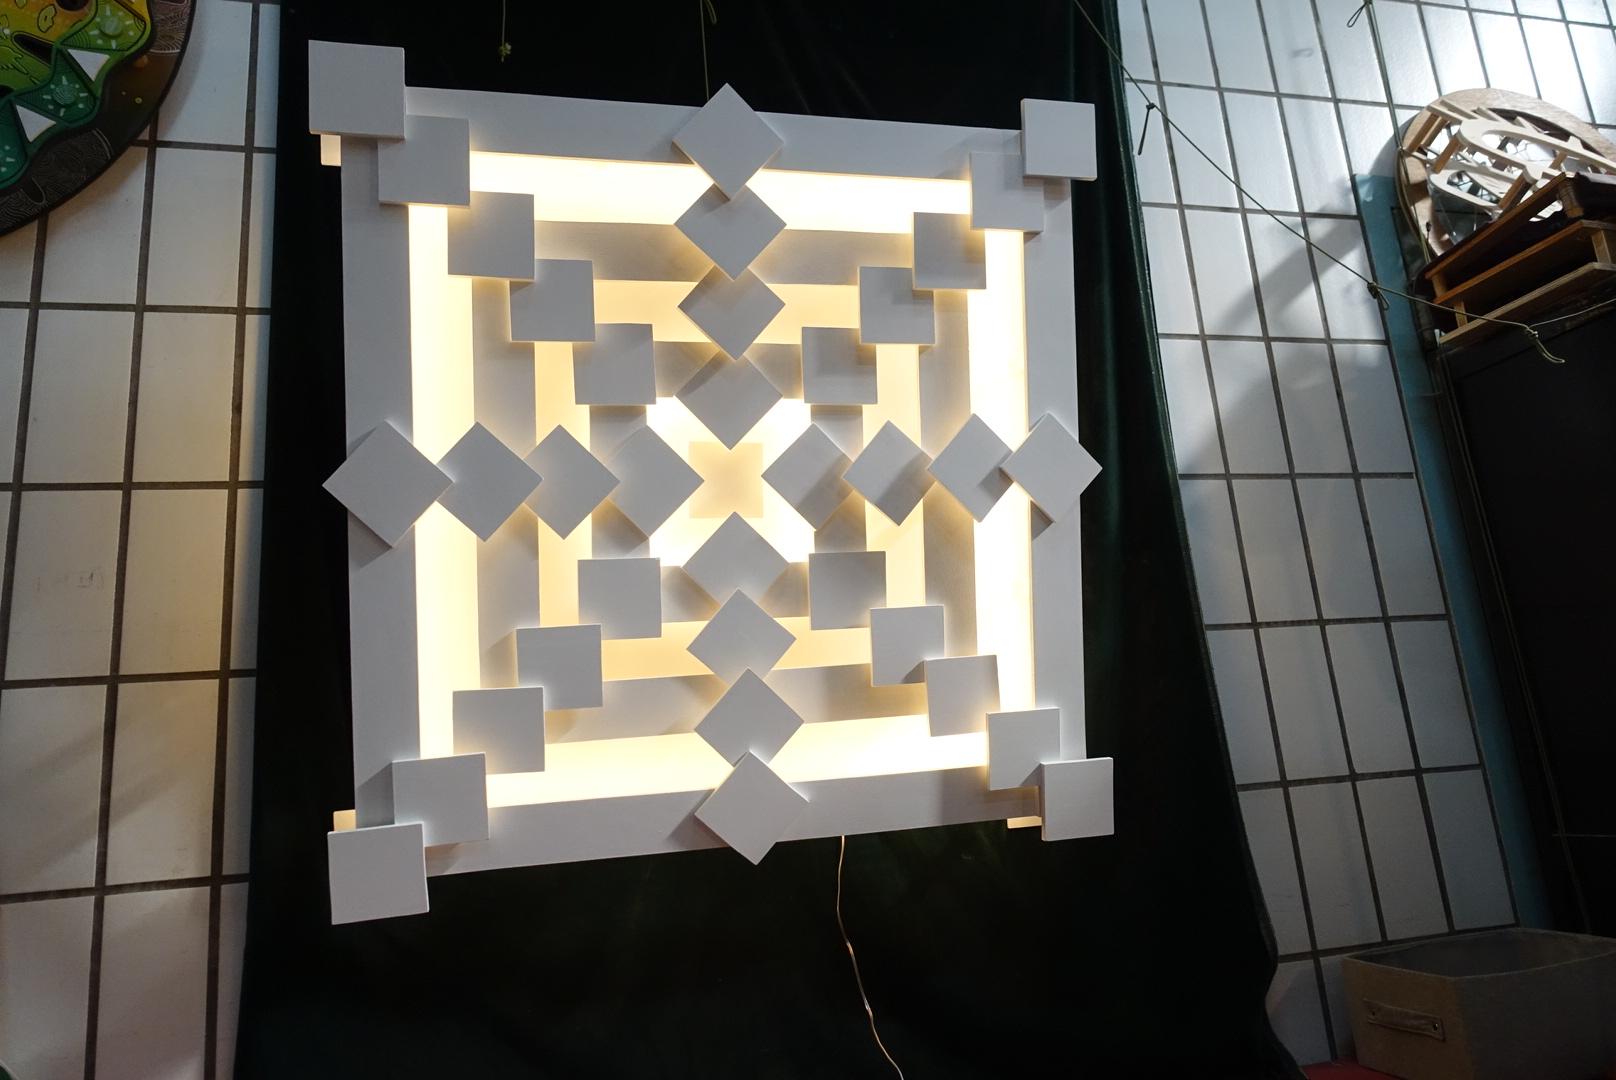 Mandala carré retro-éclairé